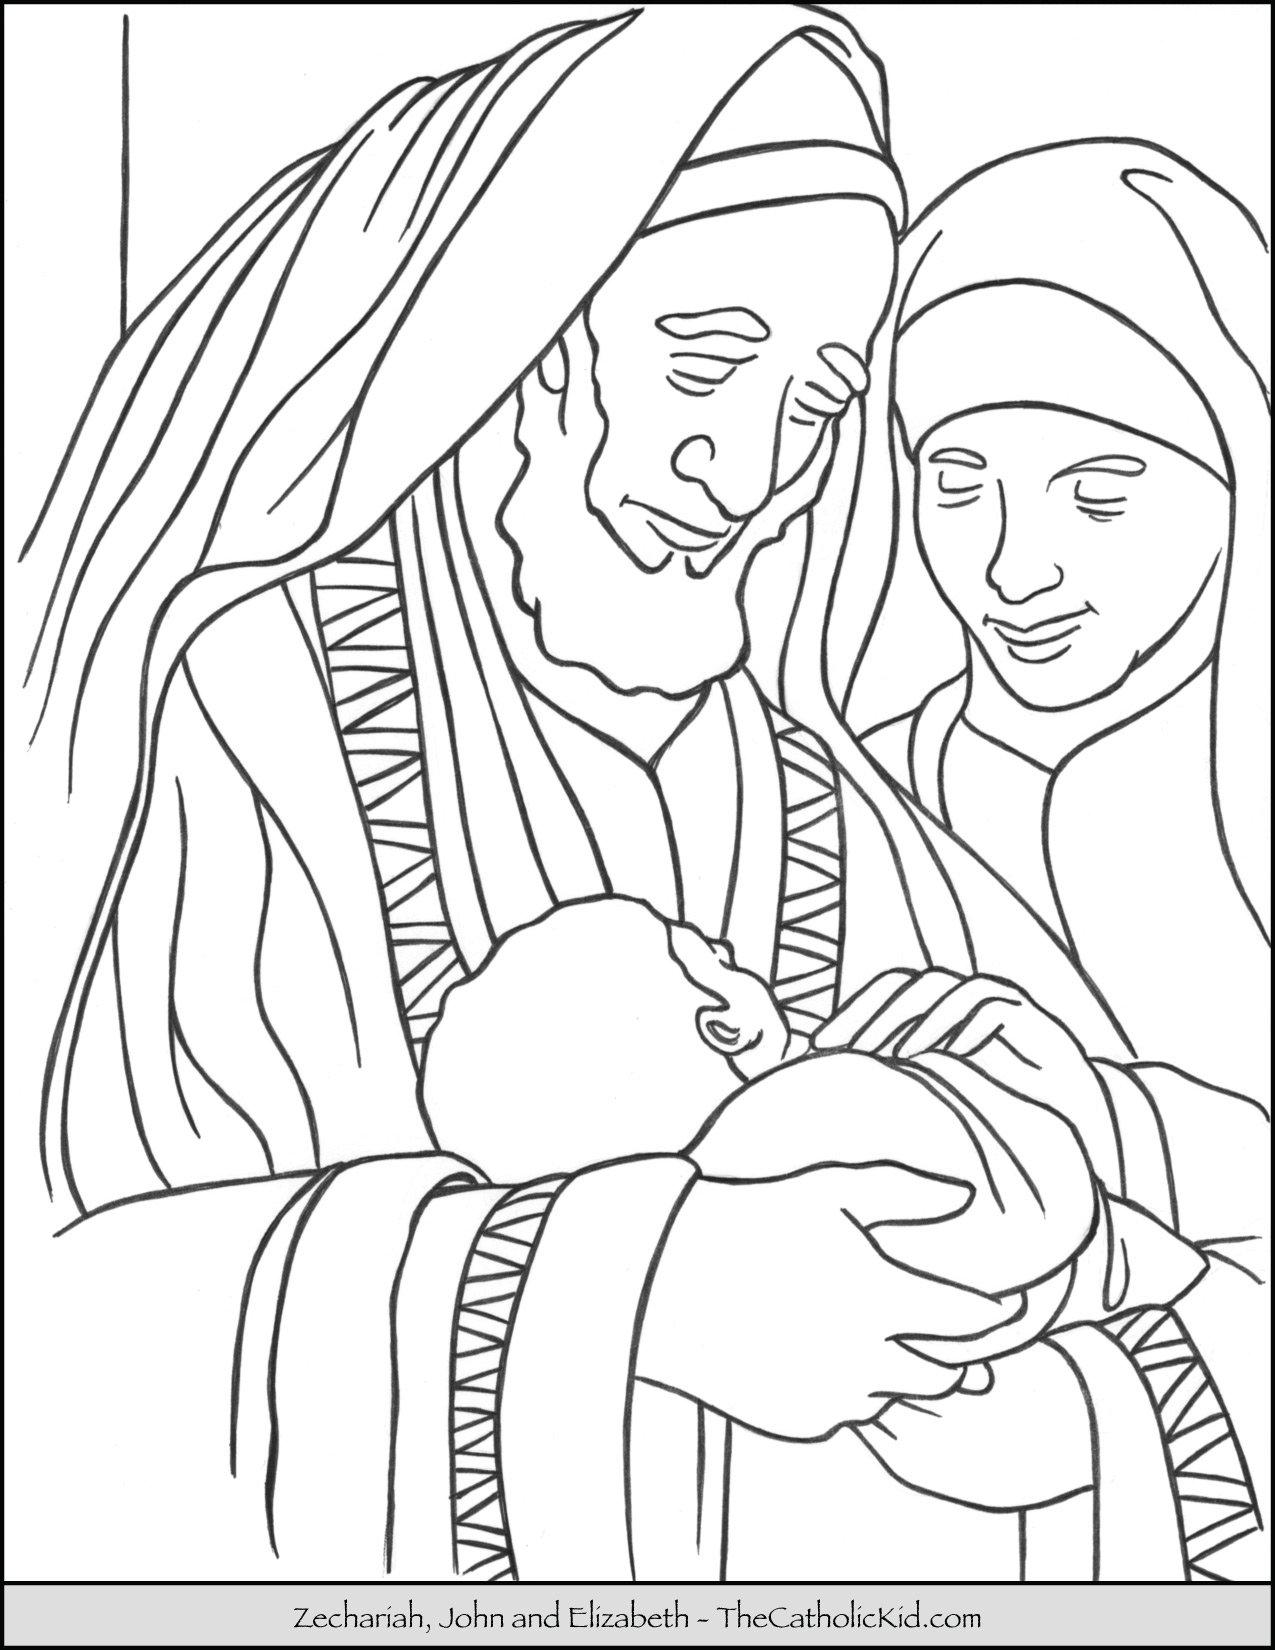 Zechariah John Elizabeth Saint Coloring Page